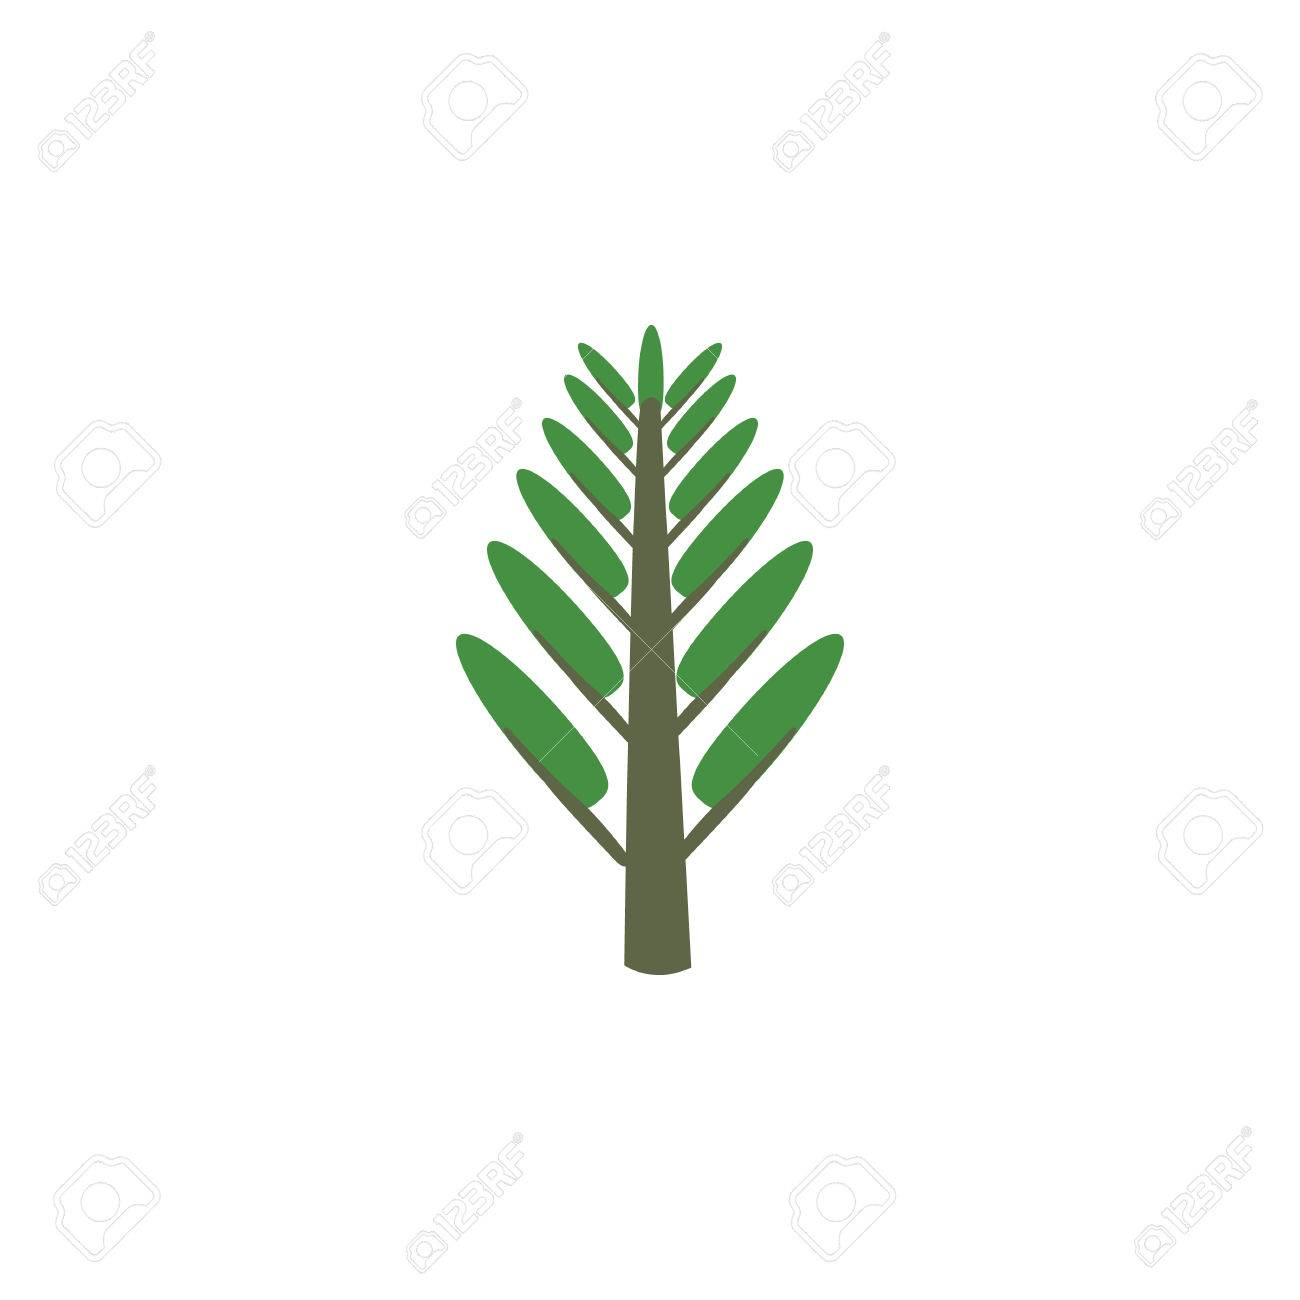 jungle vector element can be used for jungle willow tree design rh 123rf com jungle vectoriel jungle vector free download